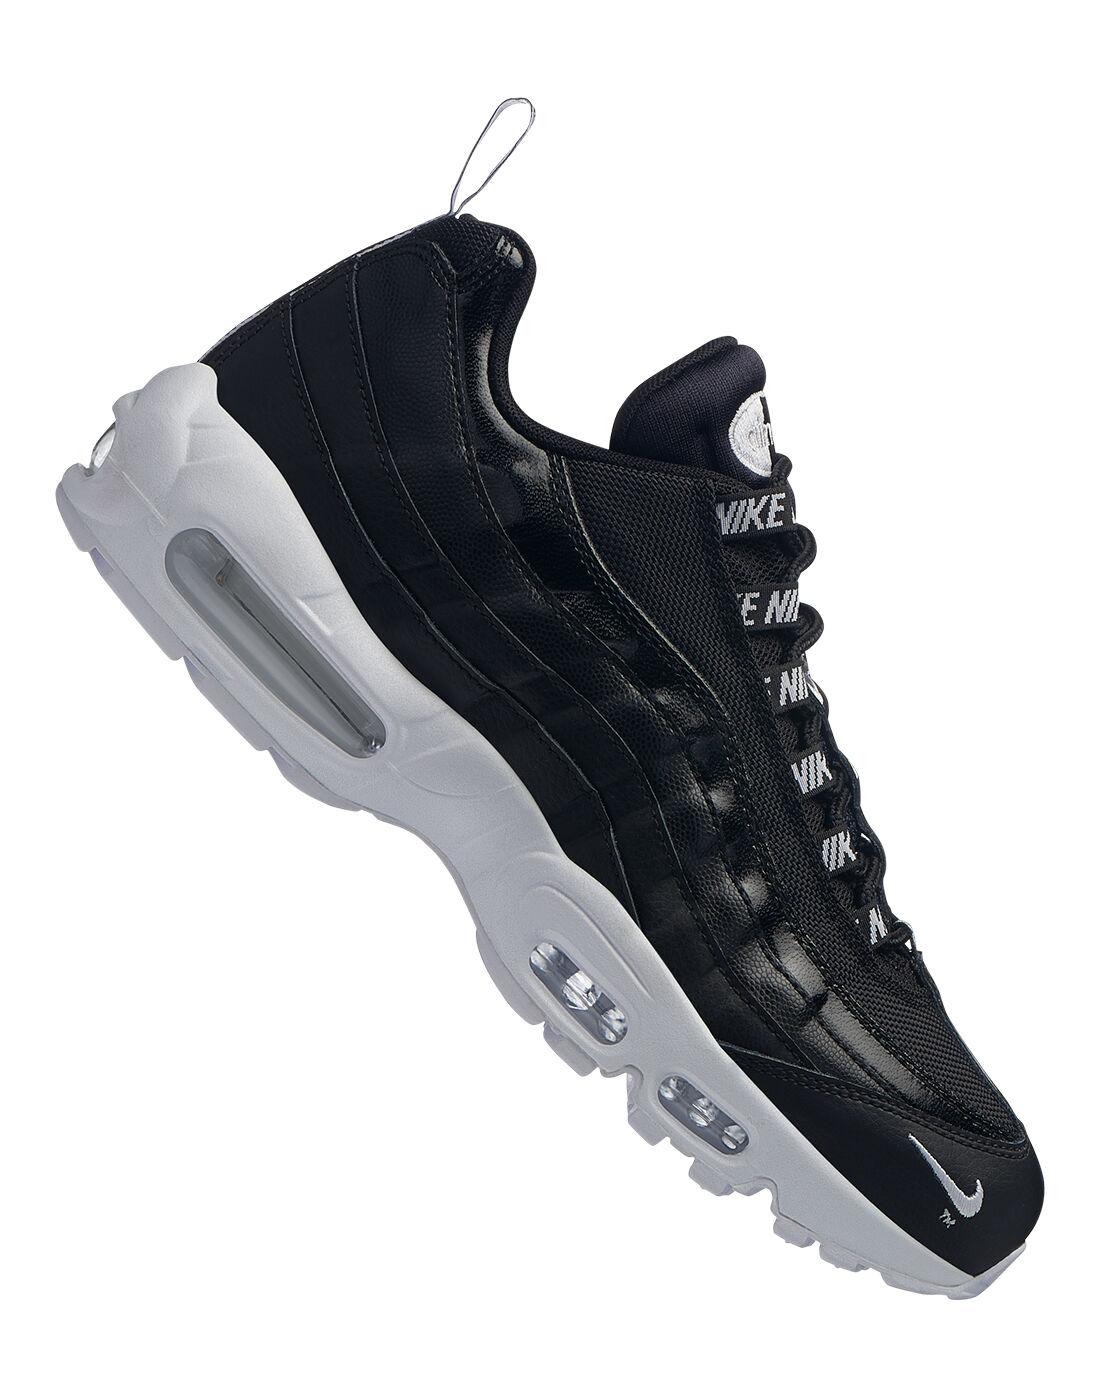 Nike Noir Air Max 95 Premium Homme [BlackBlack Muslin White Running]